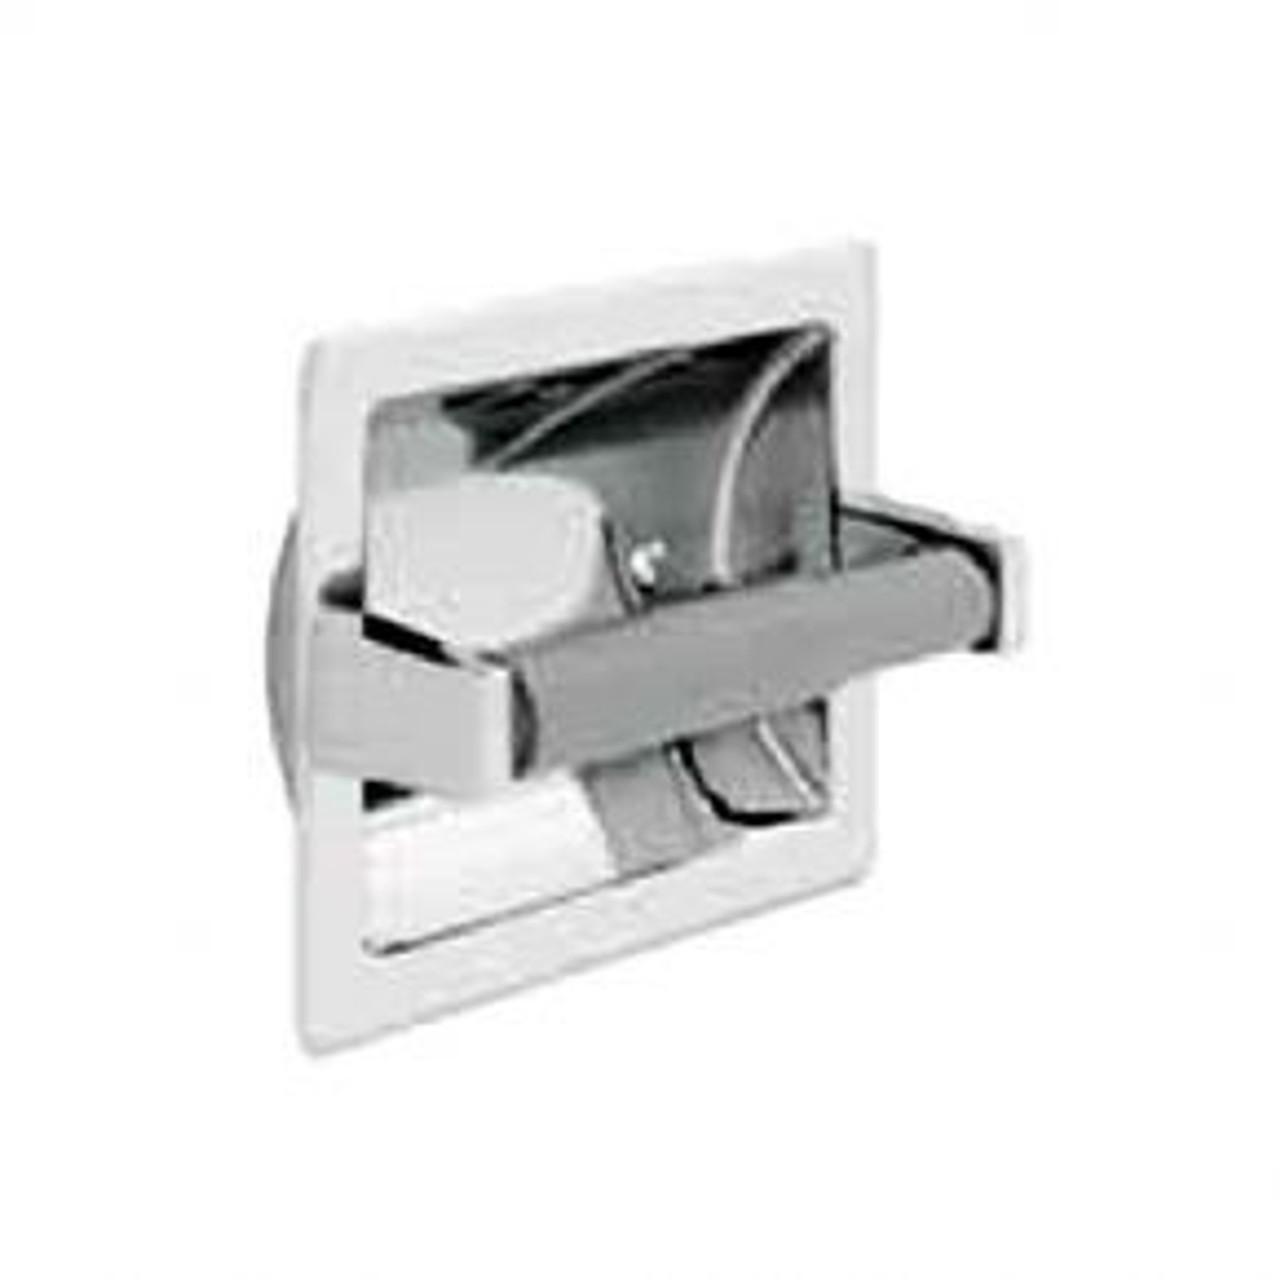 Commercial Bath 807b Recessed Toilet Tissue Dispenser Chrome